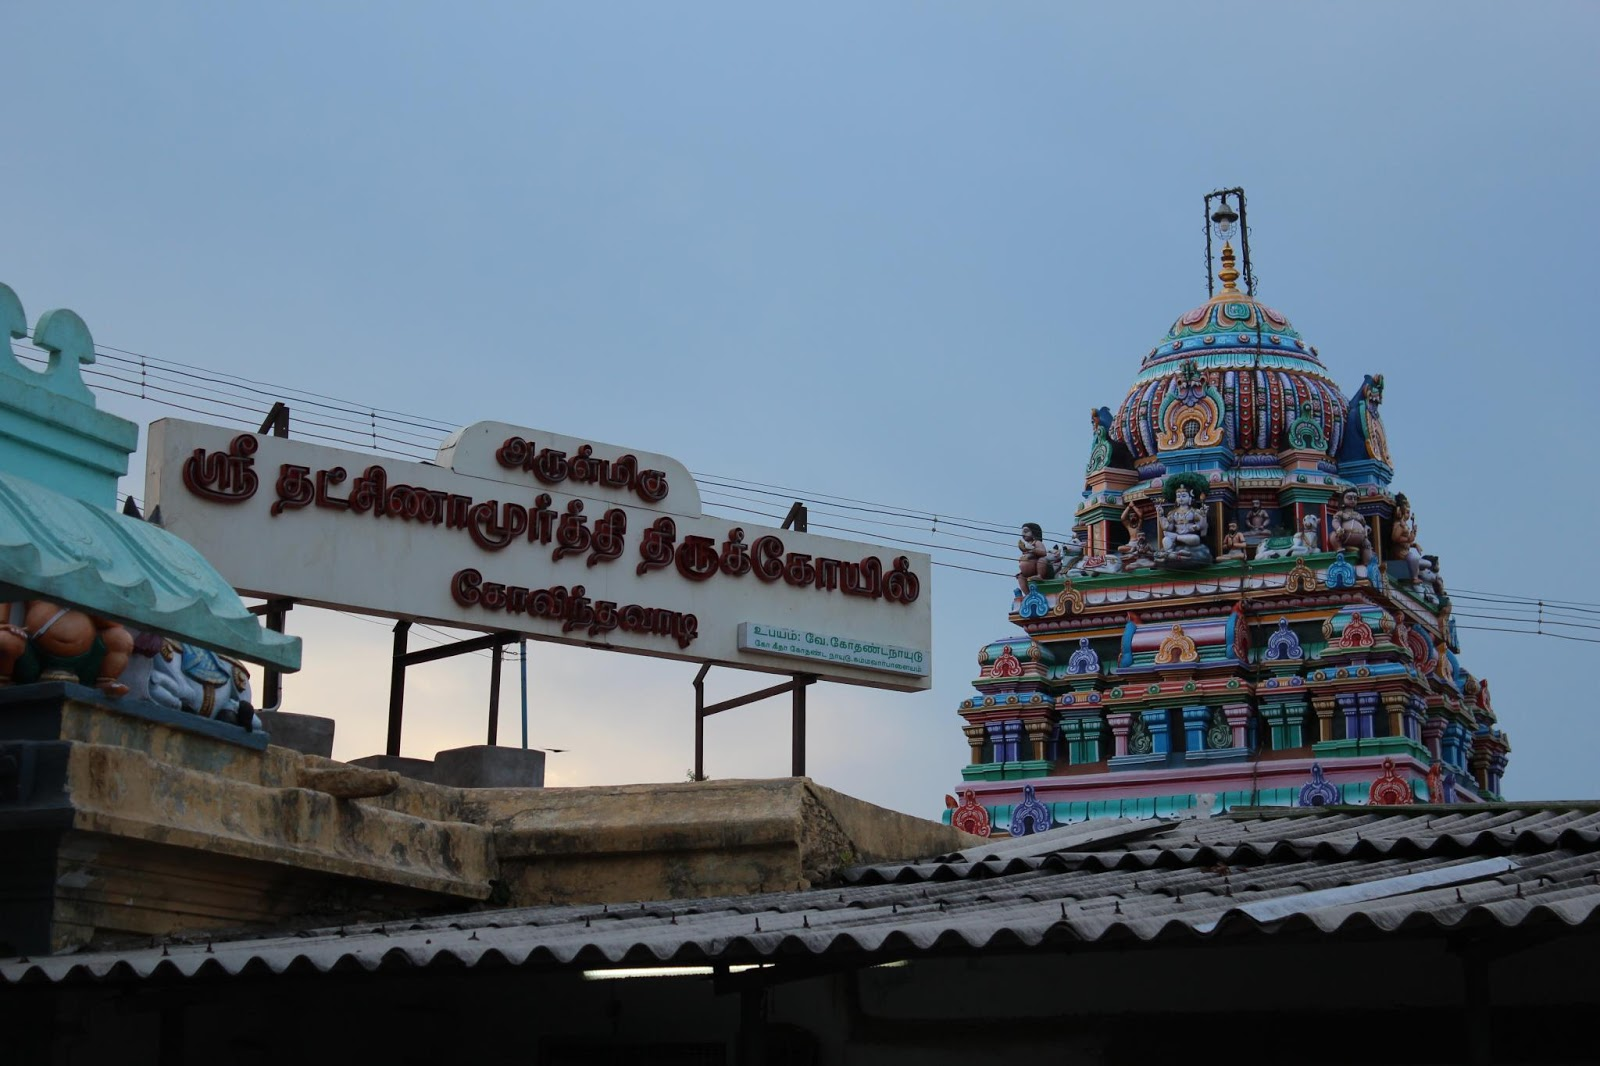 Guru dakshinamurthy temple in bangalore dating